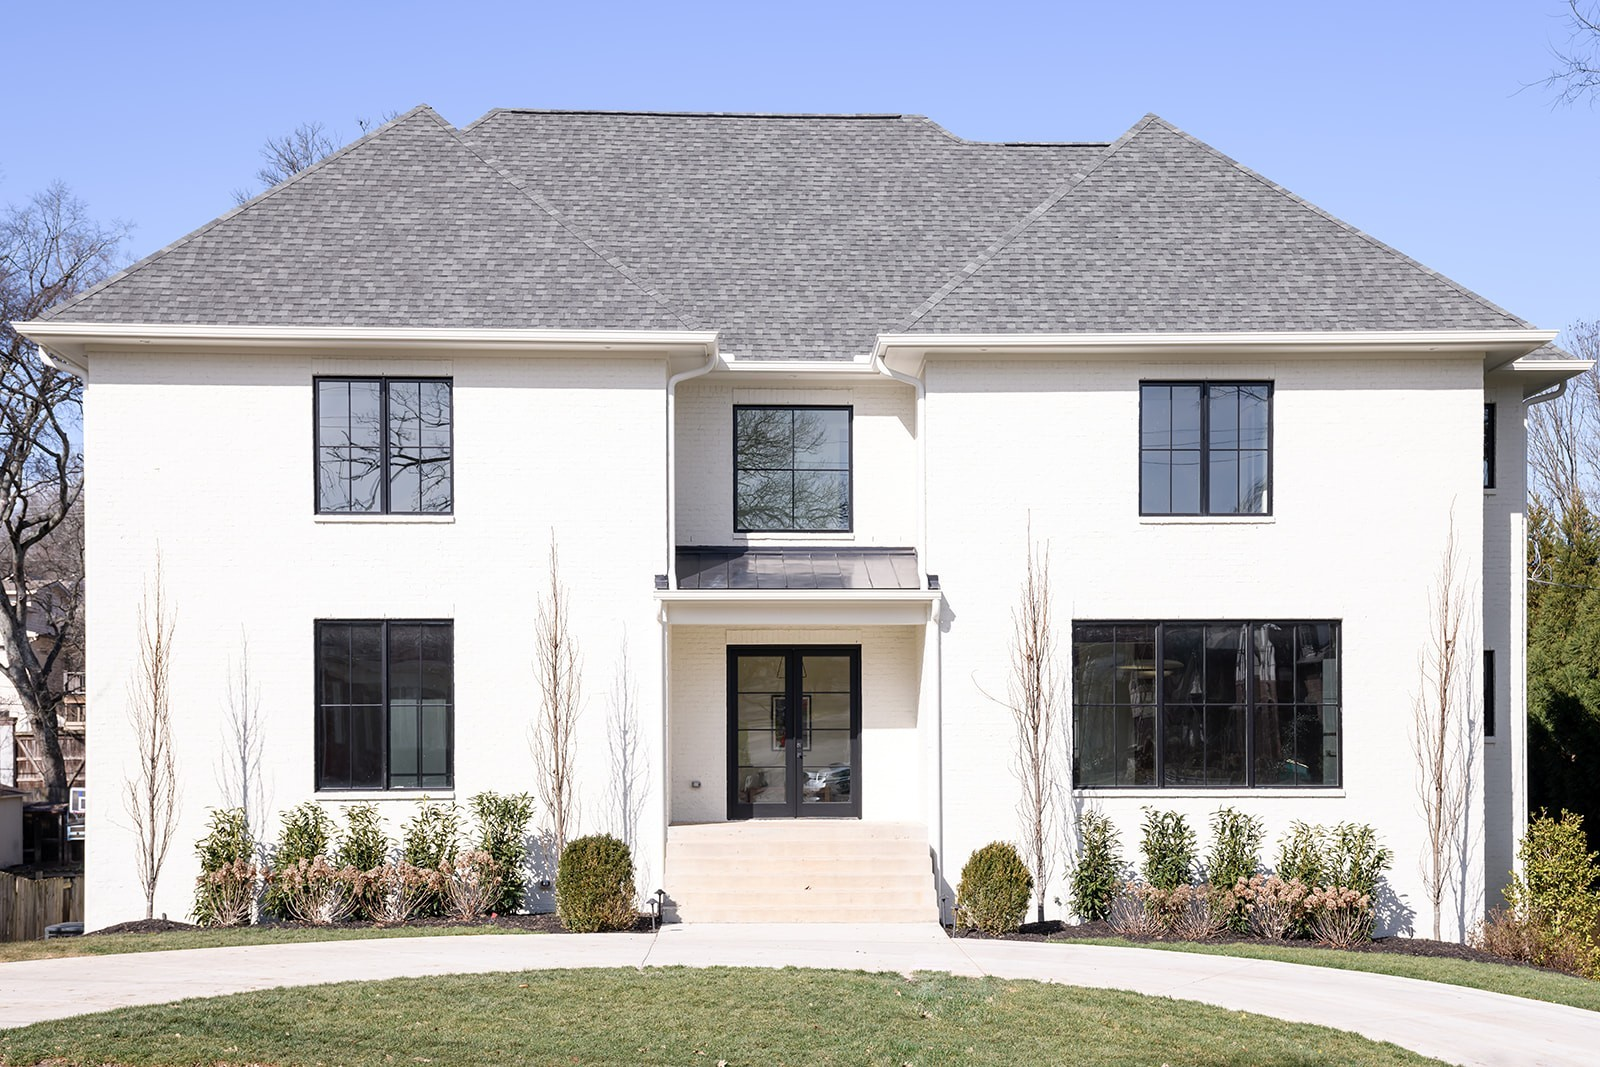 1712 Rosewood Ave Property Photo - Nashville, TN real estate listing